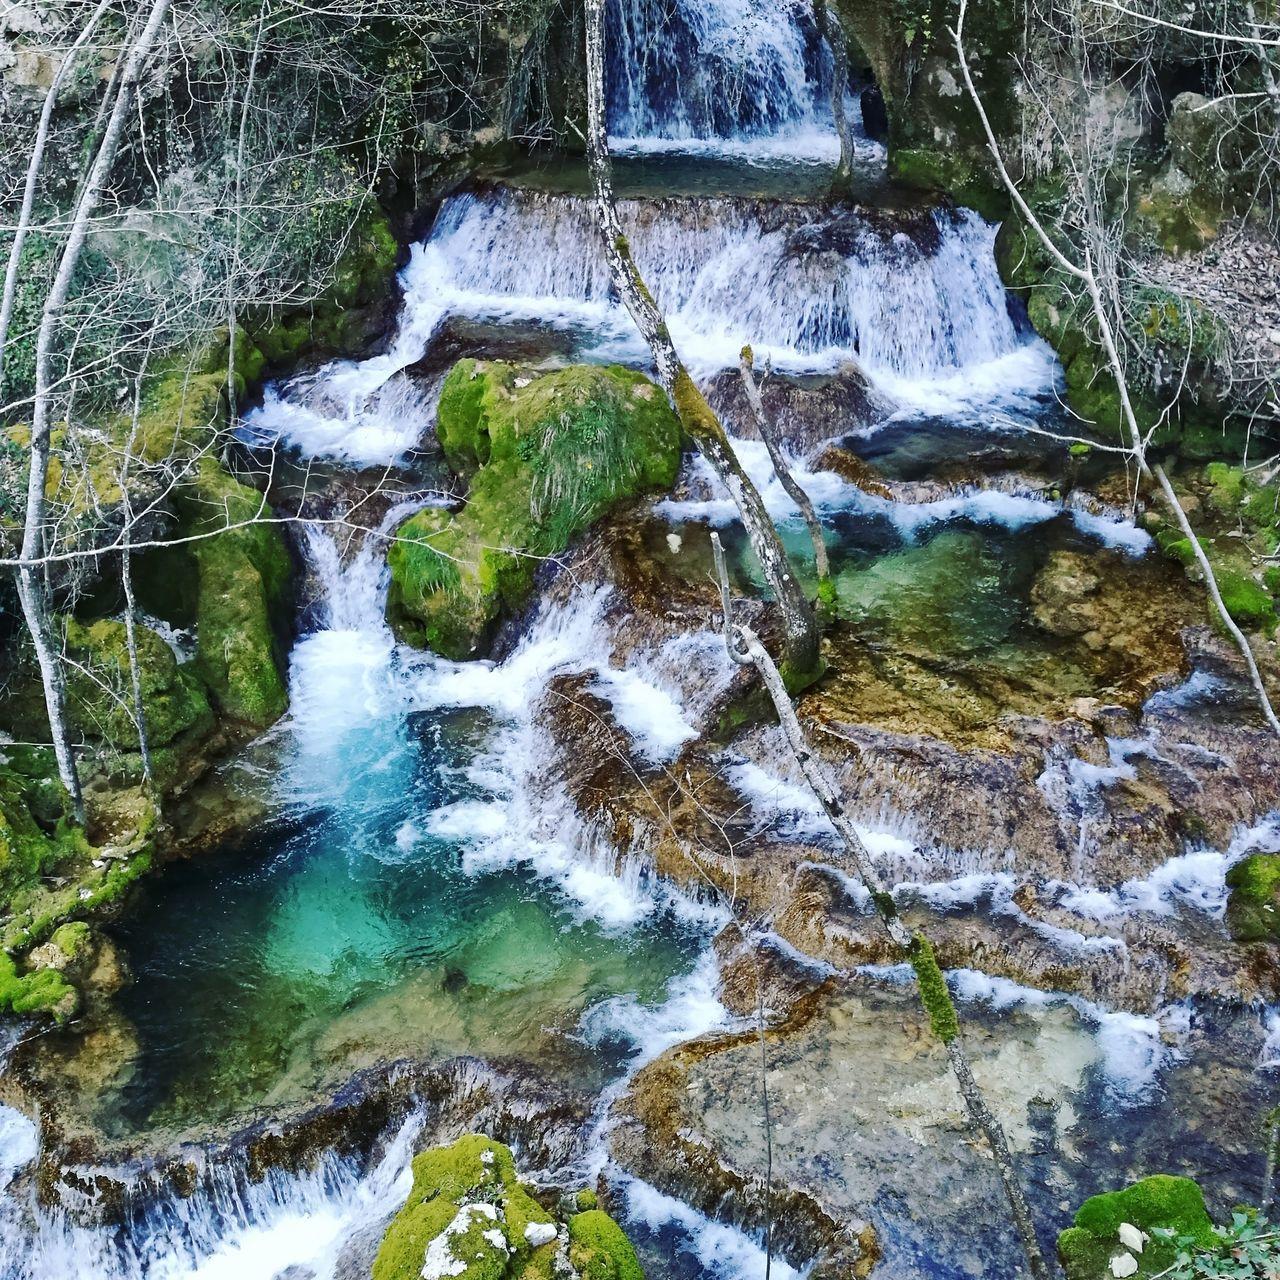 Nacedero Del Río Urederra Baquedano Navarra Paradise Paraíso Nature Naturaleza Belleza Water Tree